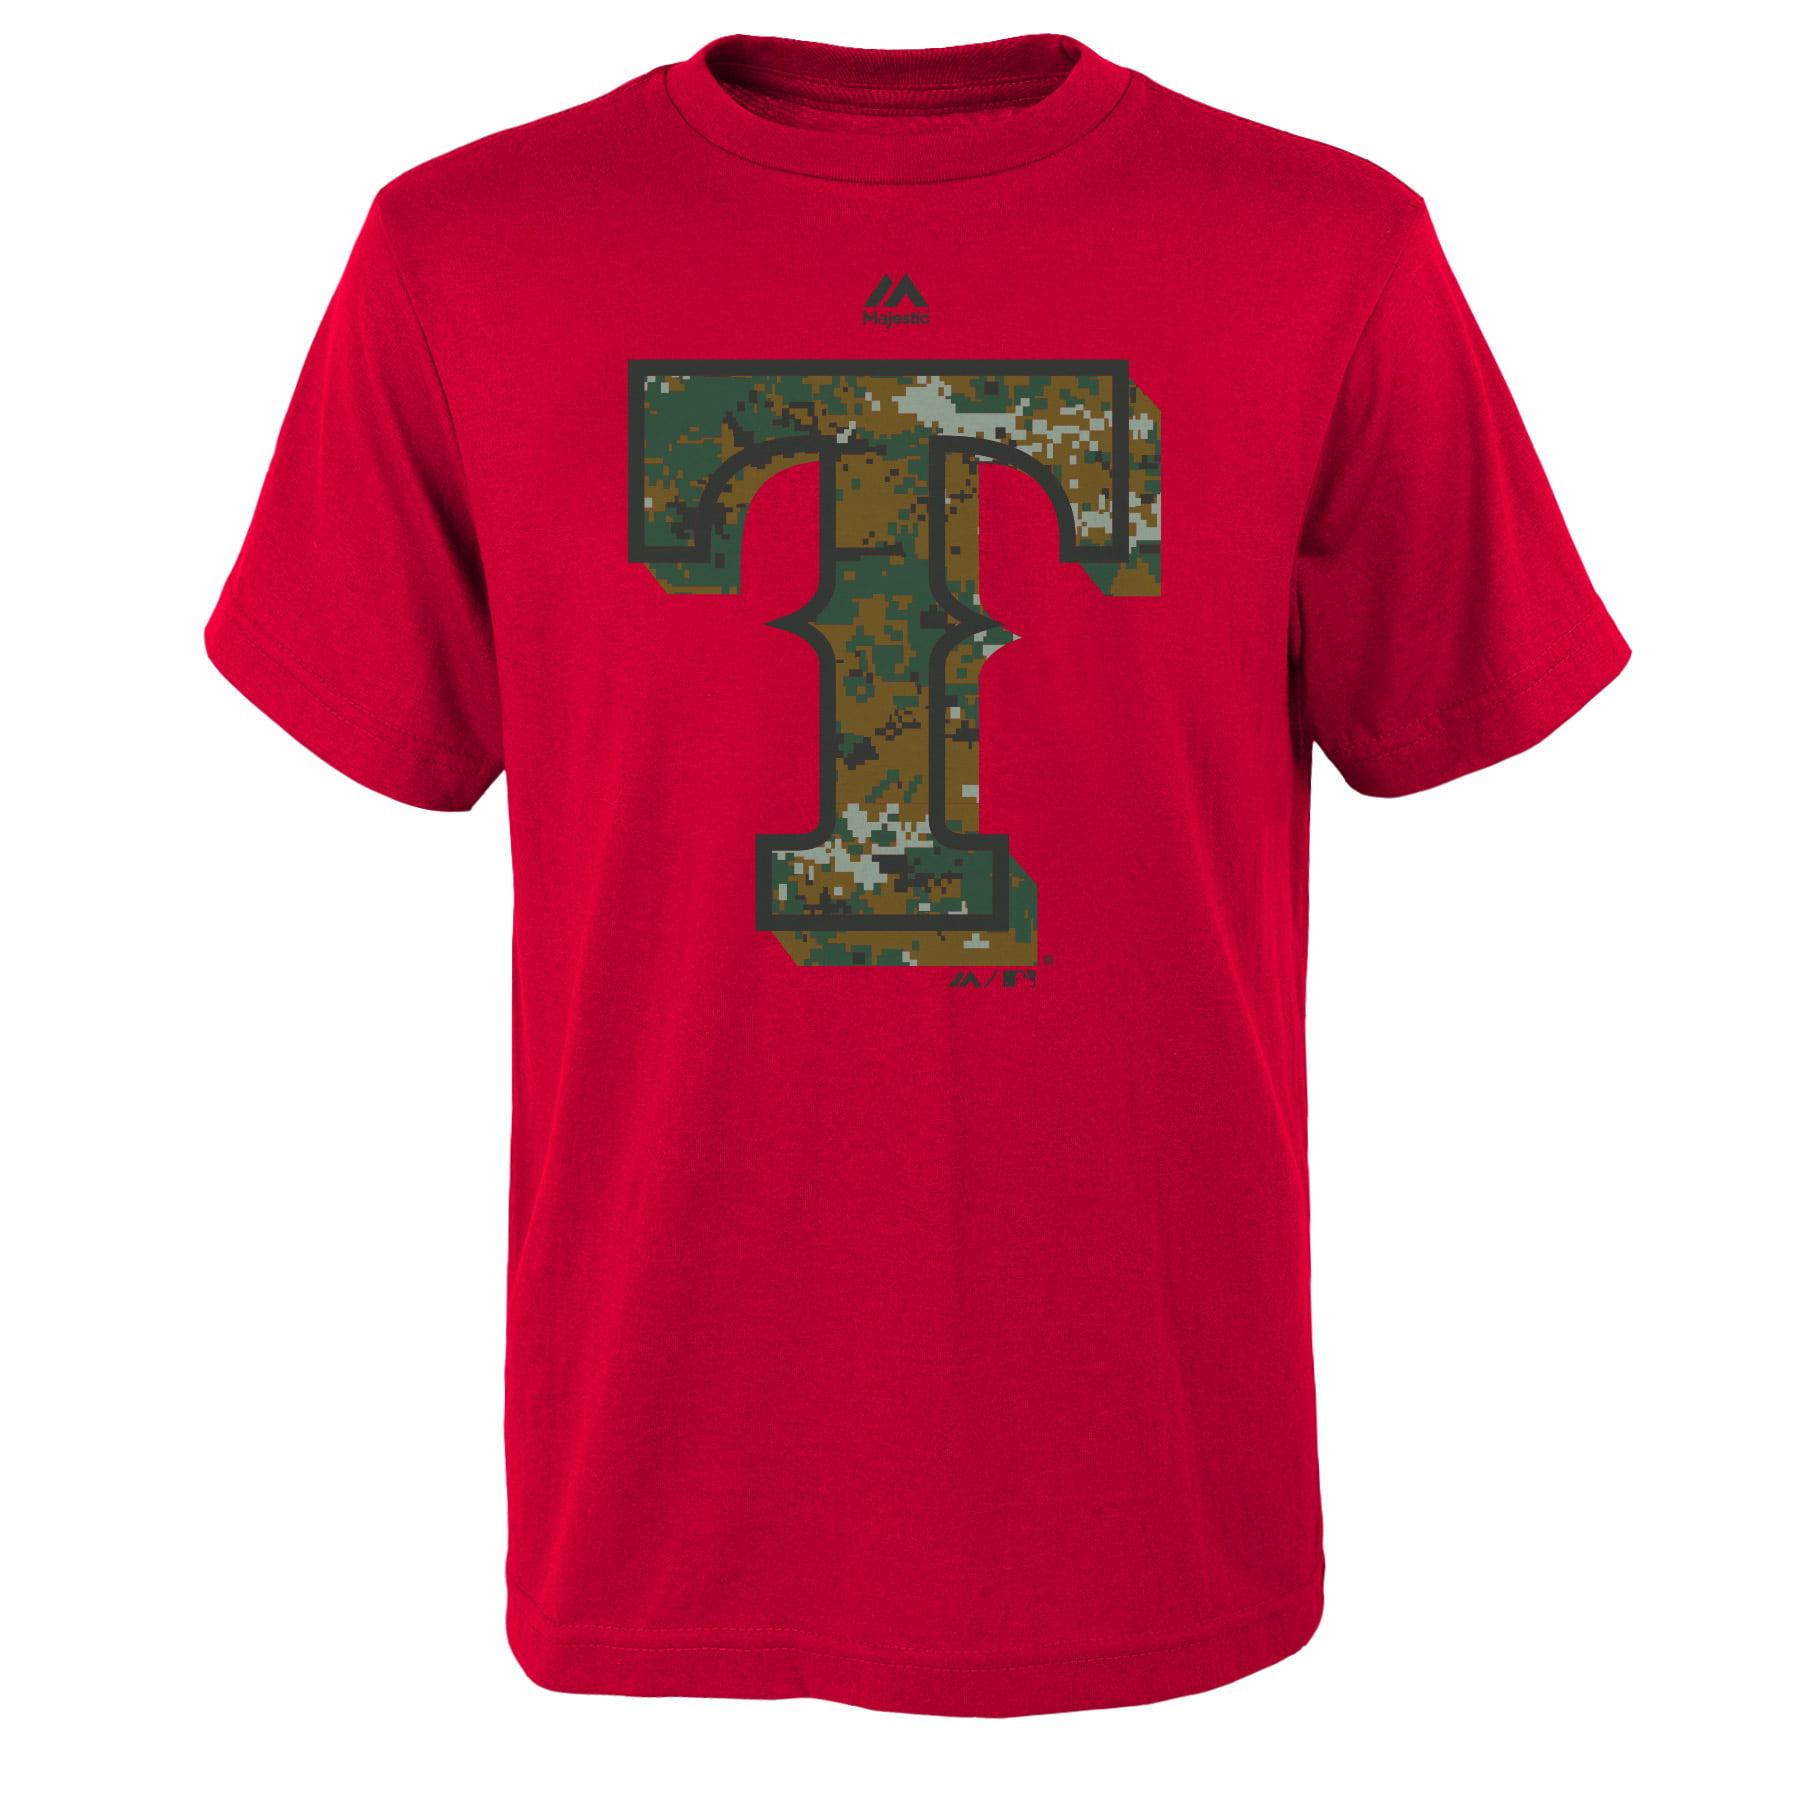 Texas Rangers Majestic Youth USMC Woodland Camo Logo T-Shirt - Royal